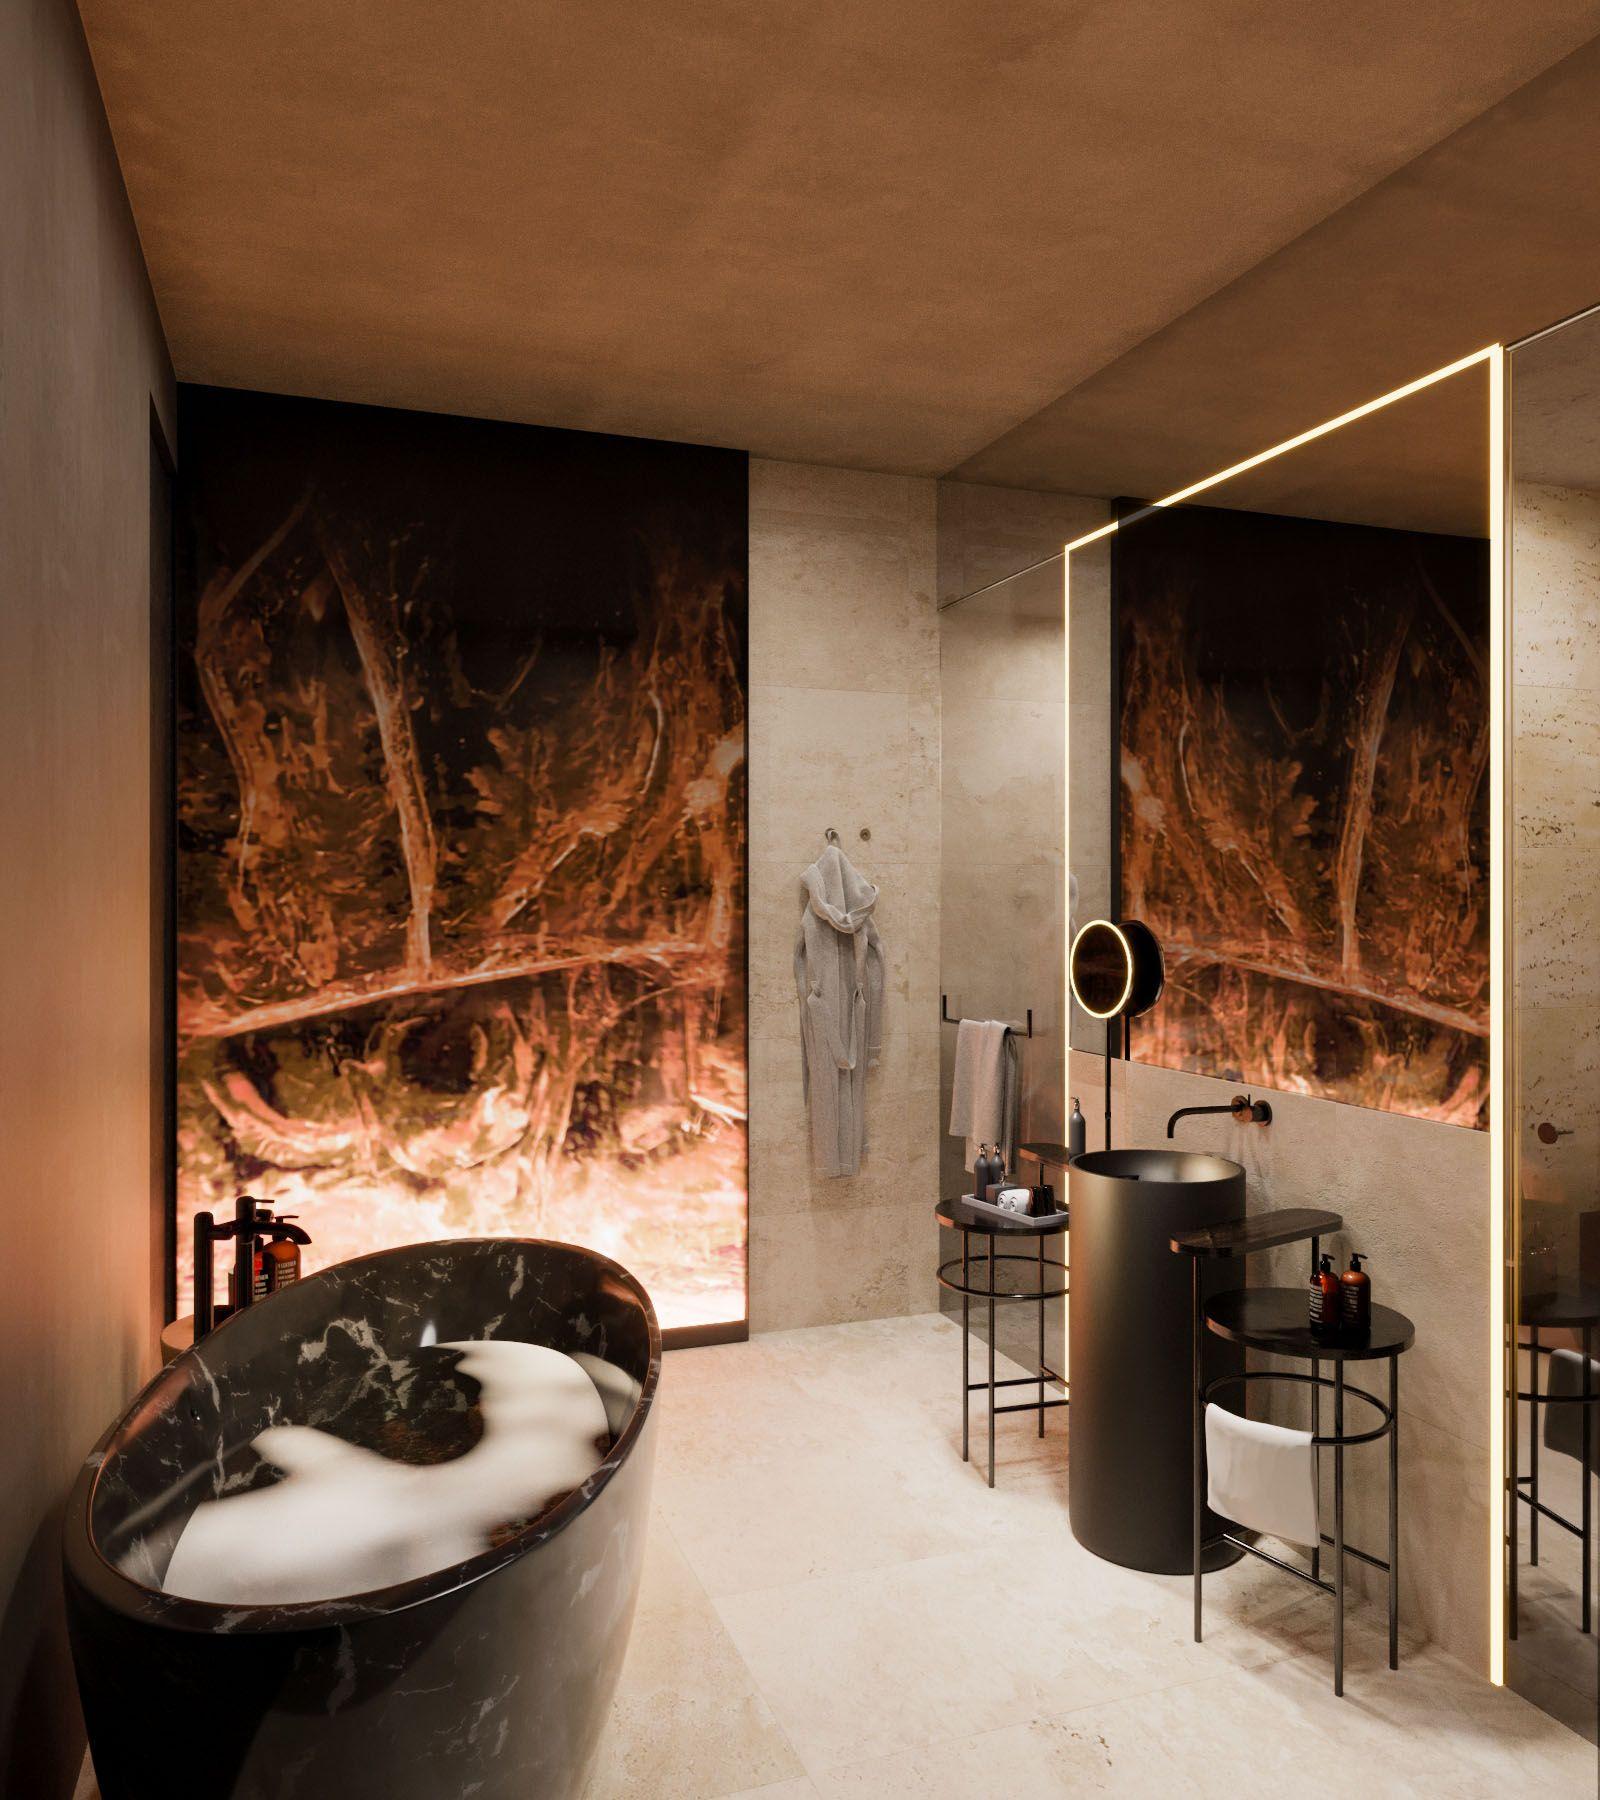 Luxurious Upscale Bathroom Interior Upscale Bathroom Design Hotel Design Luxury Hotel Design Modern Design Hotel Interior Design Sundukov V 2020 G